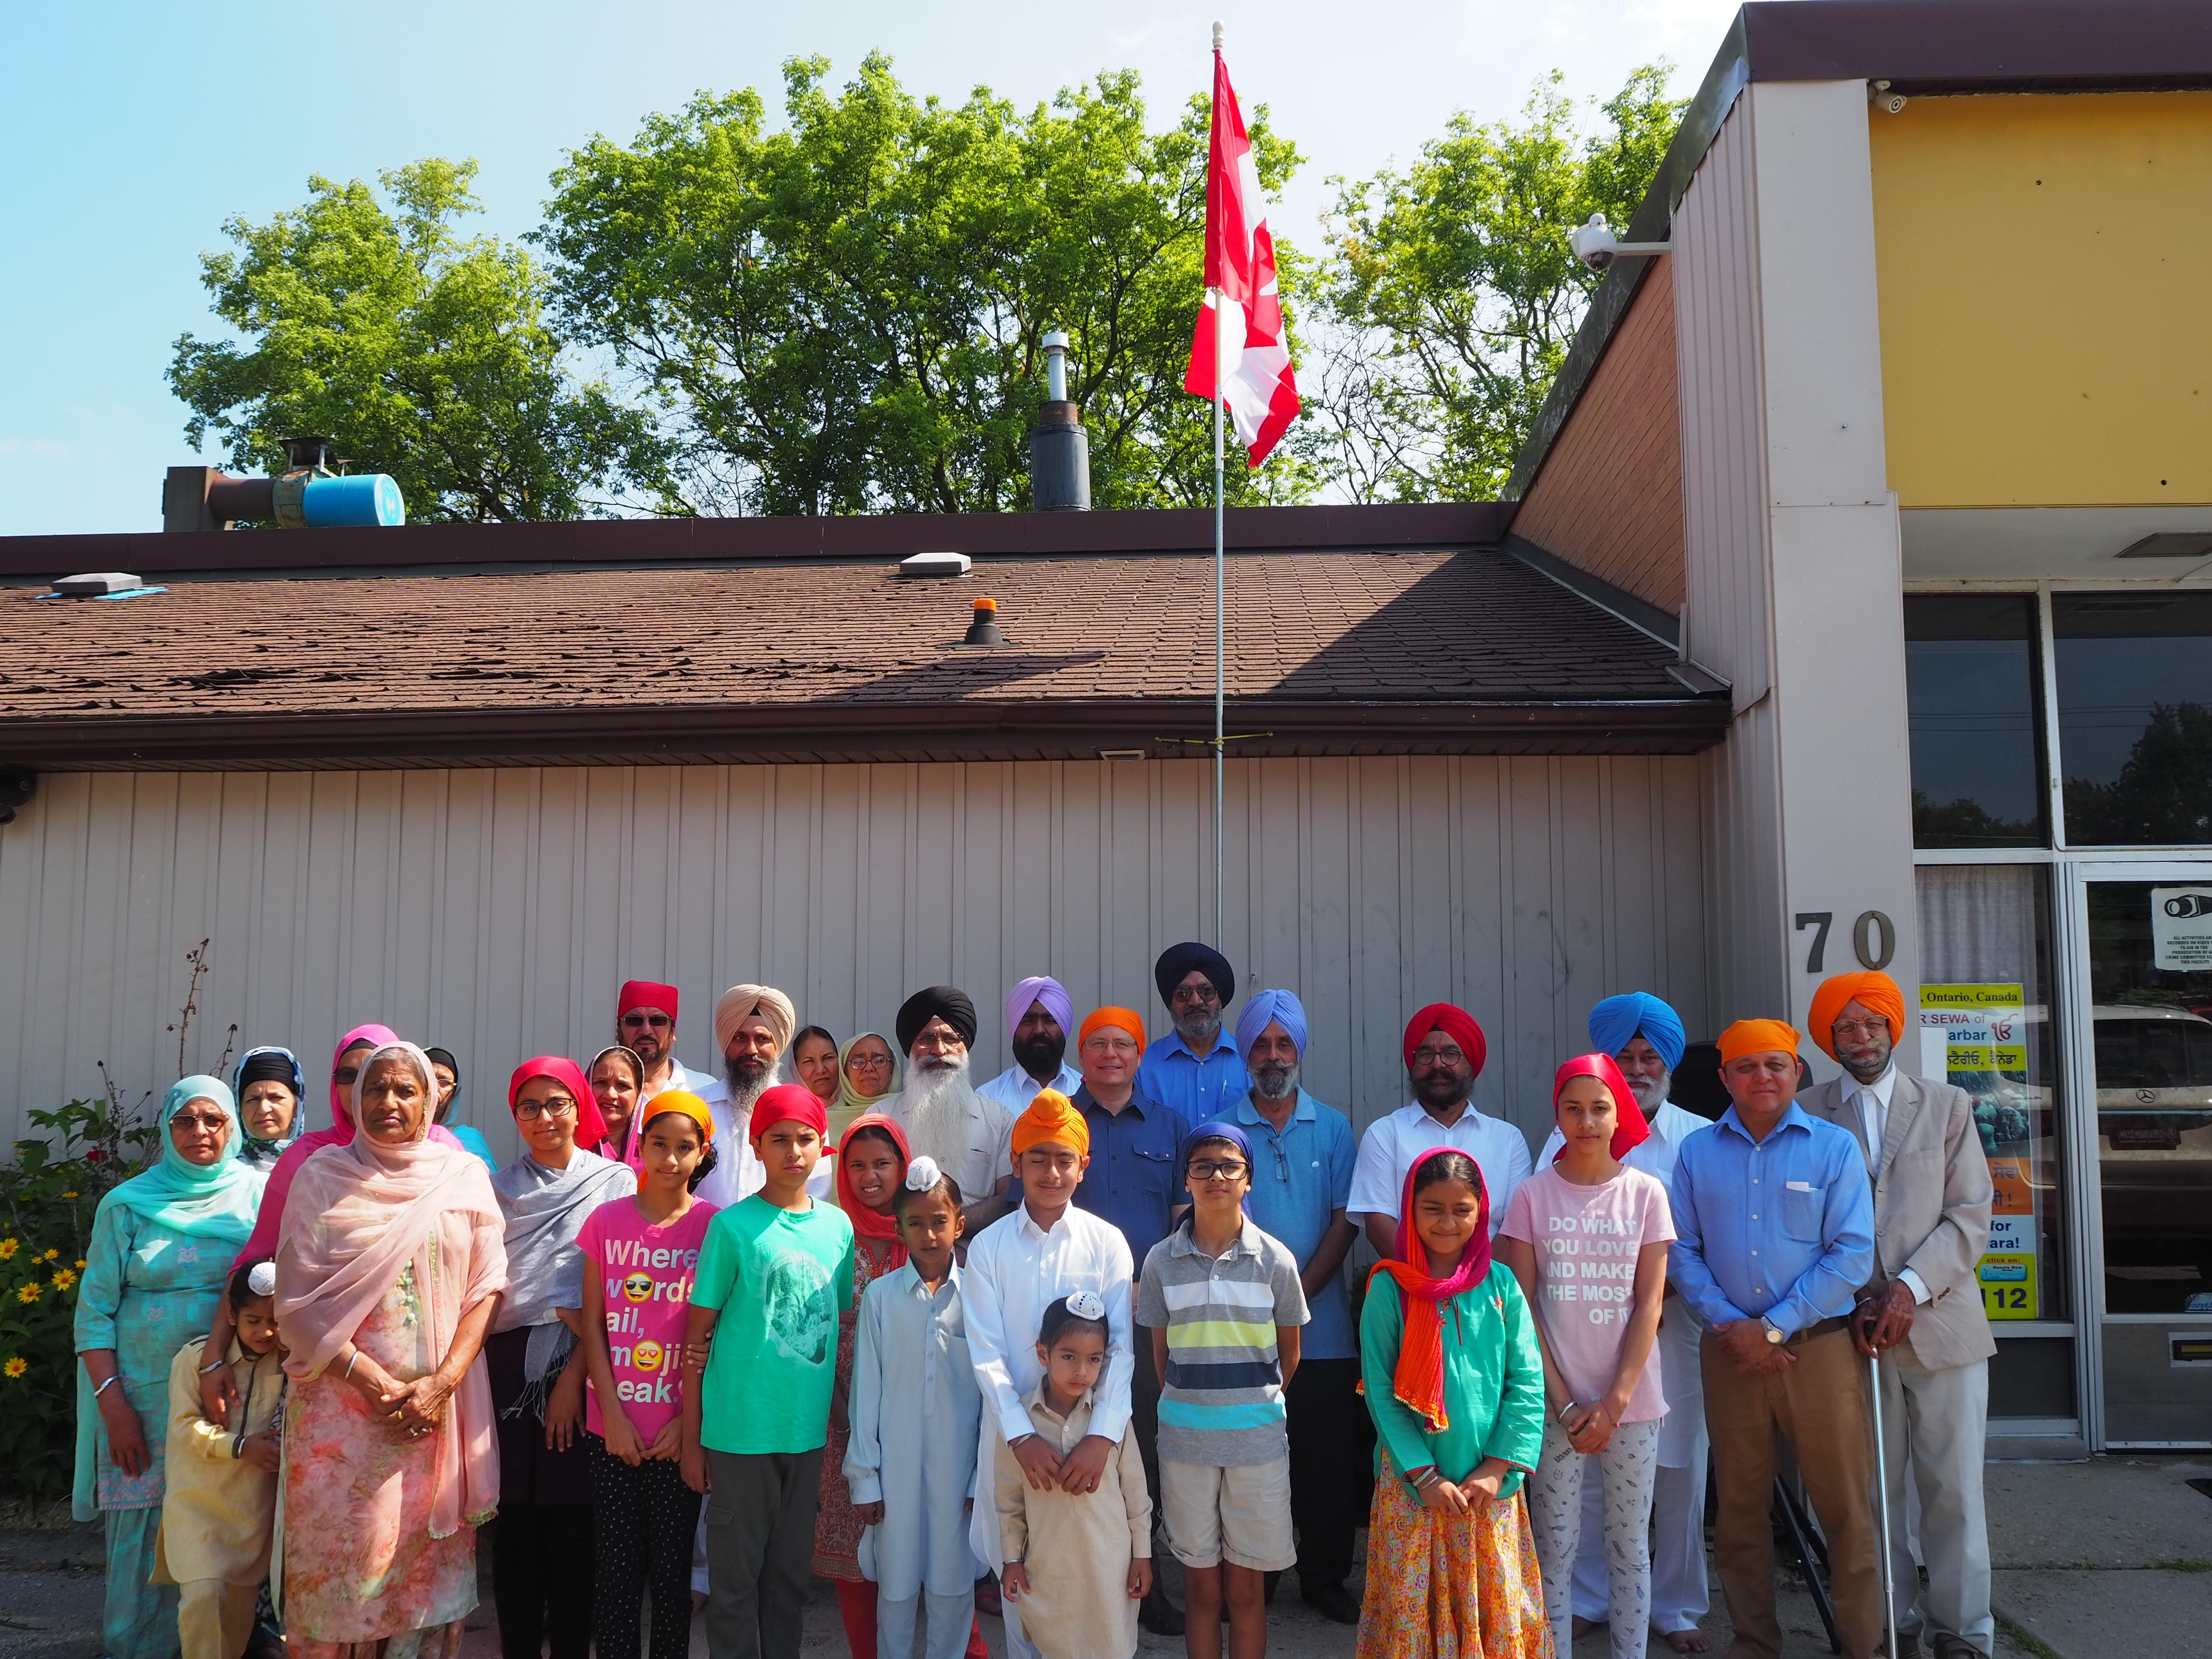 Canada Day 2018 Celebrations